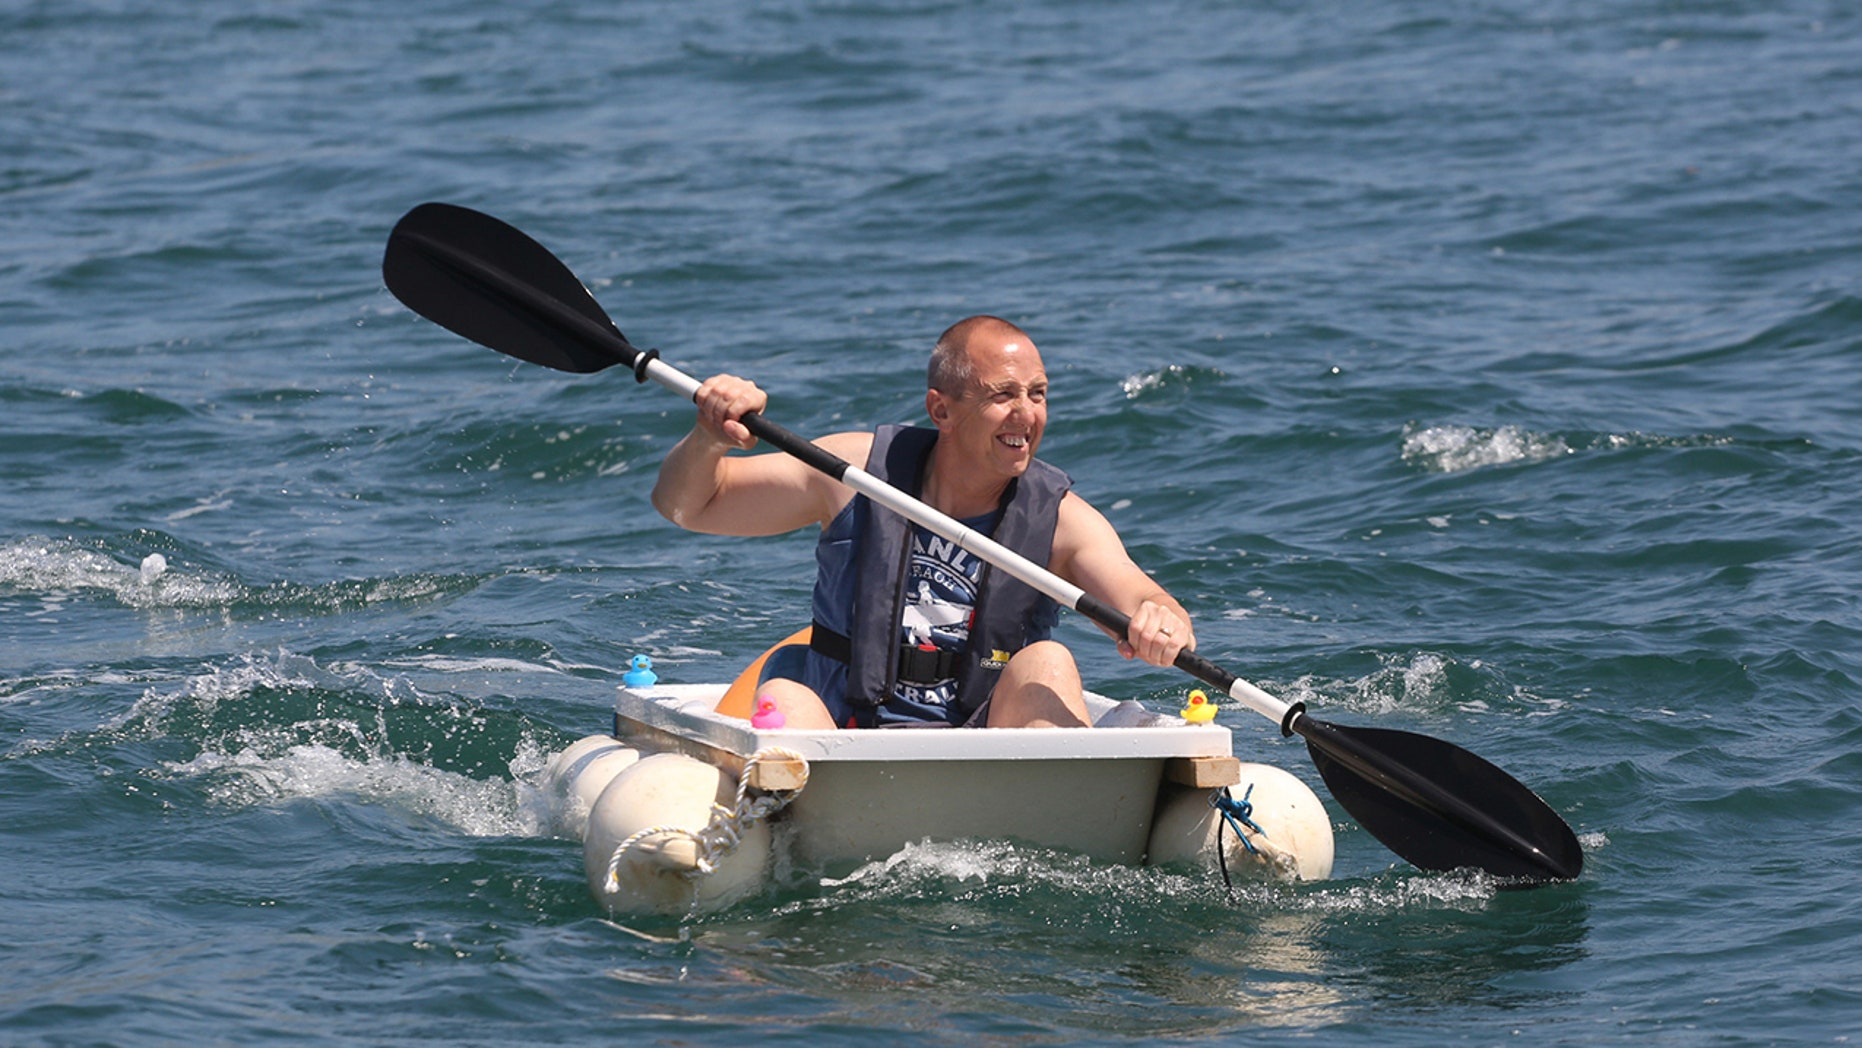 Plumber Iain Bevan, 51, rows across seas at Torbay inside a bath tub to raise money for charity.